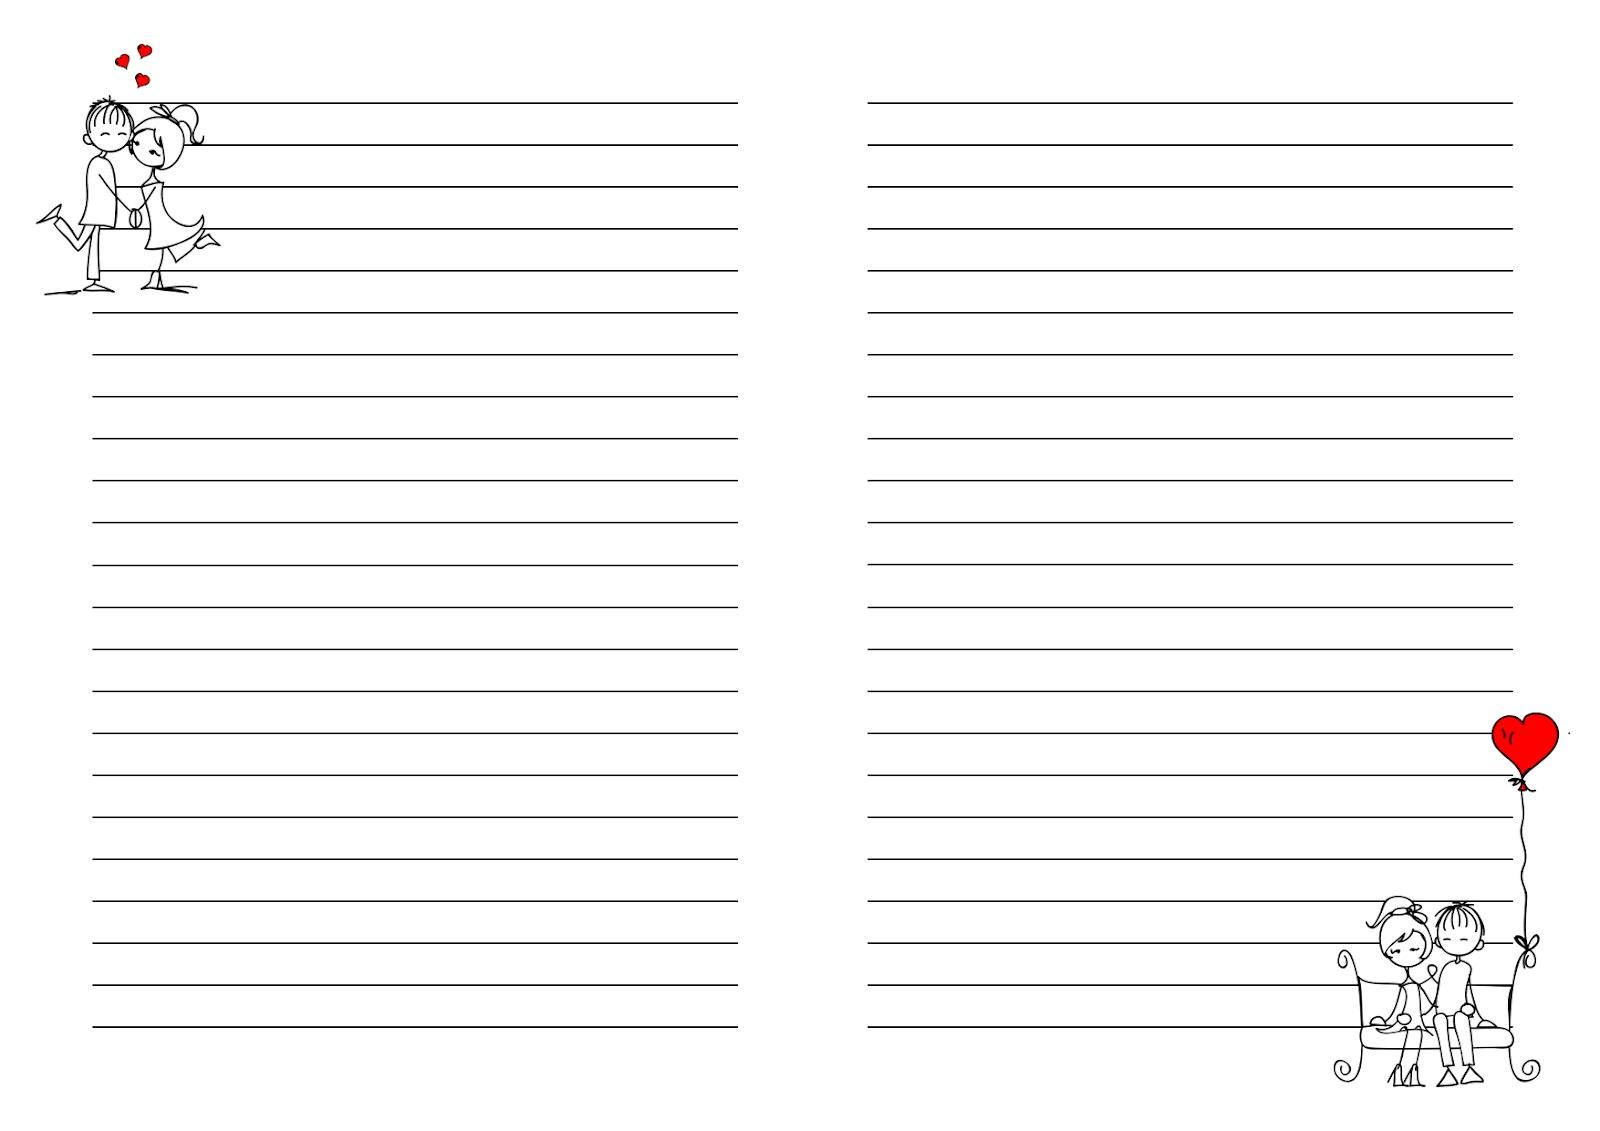 картинки для блокнота черно белые